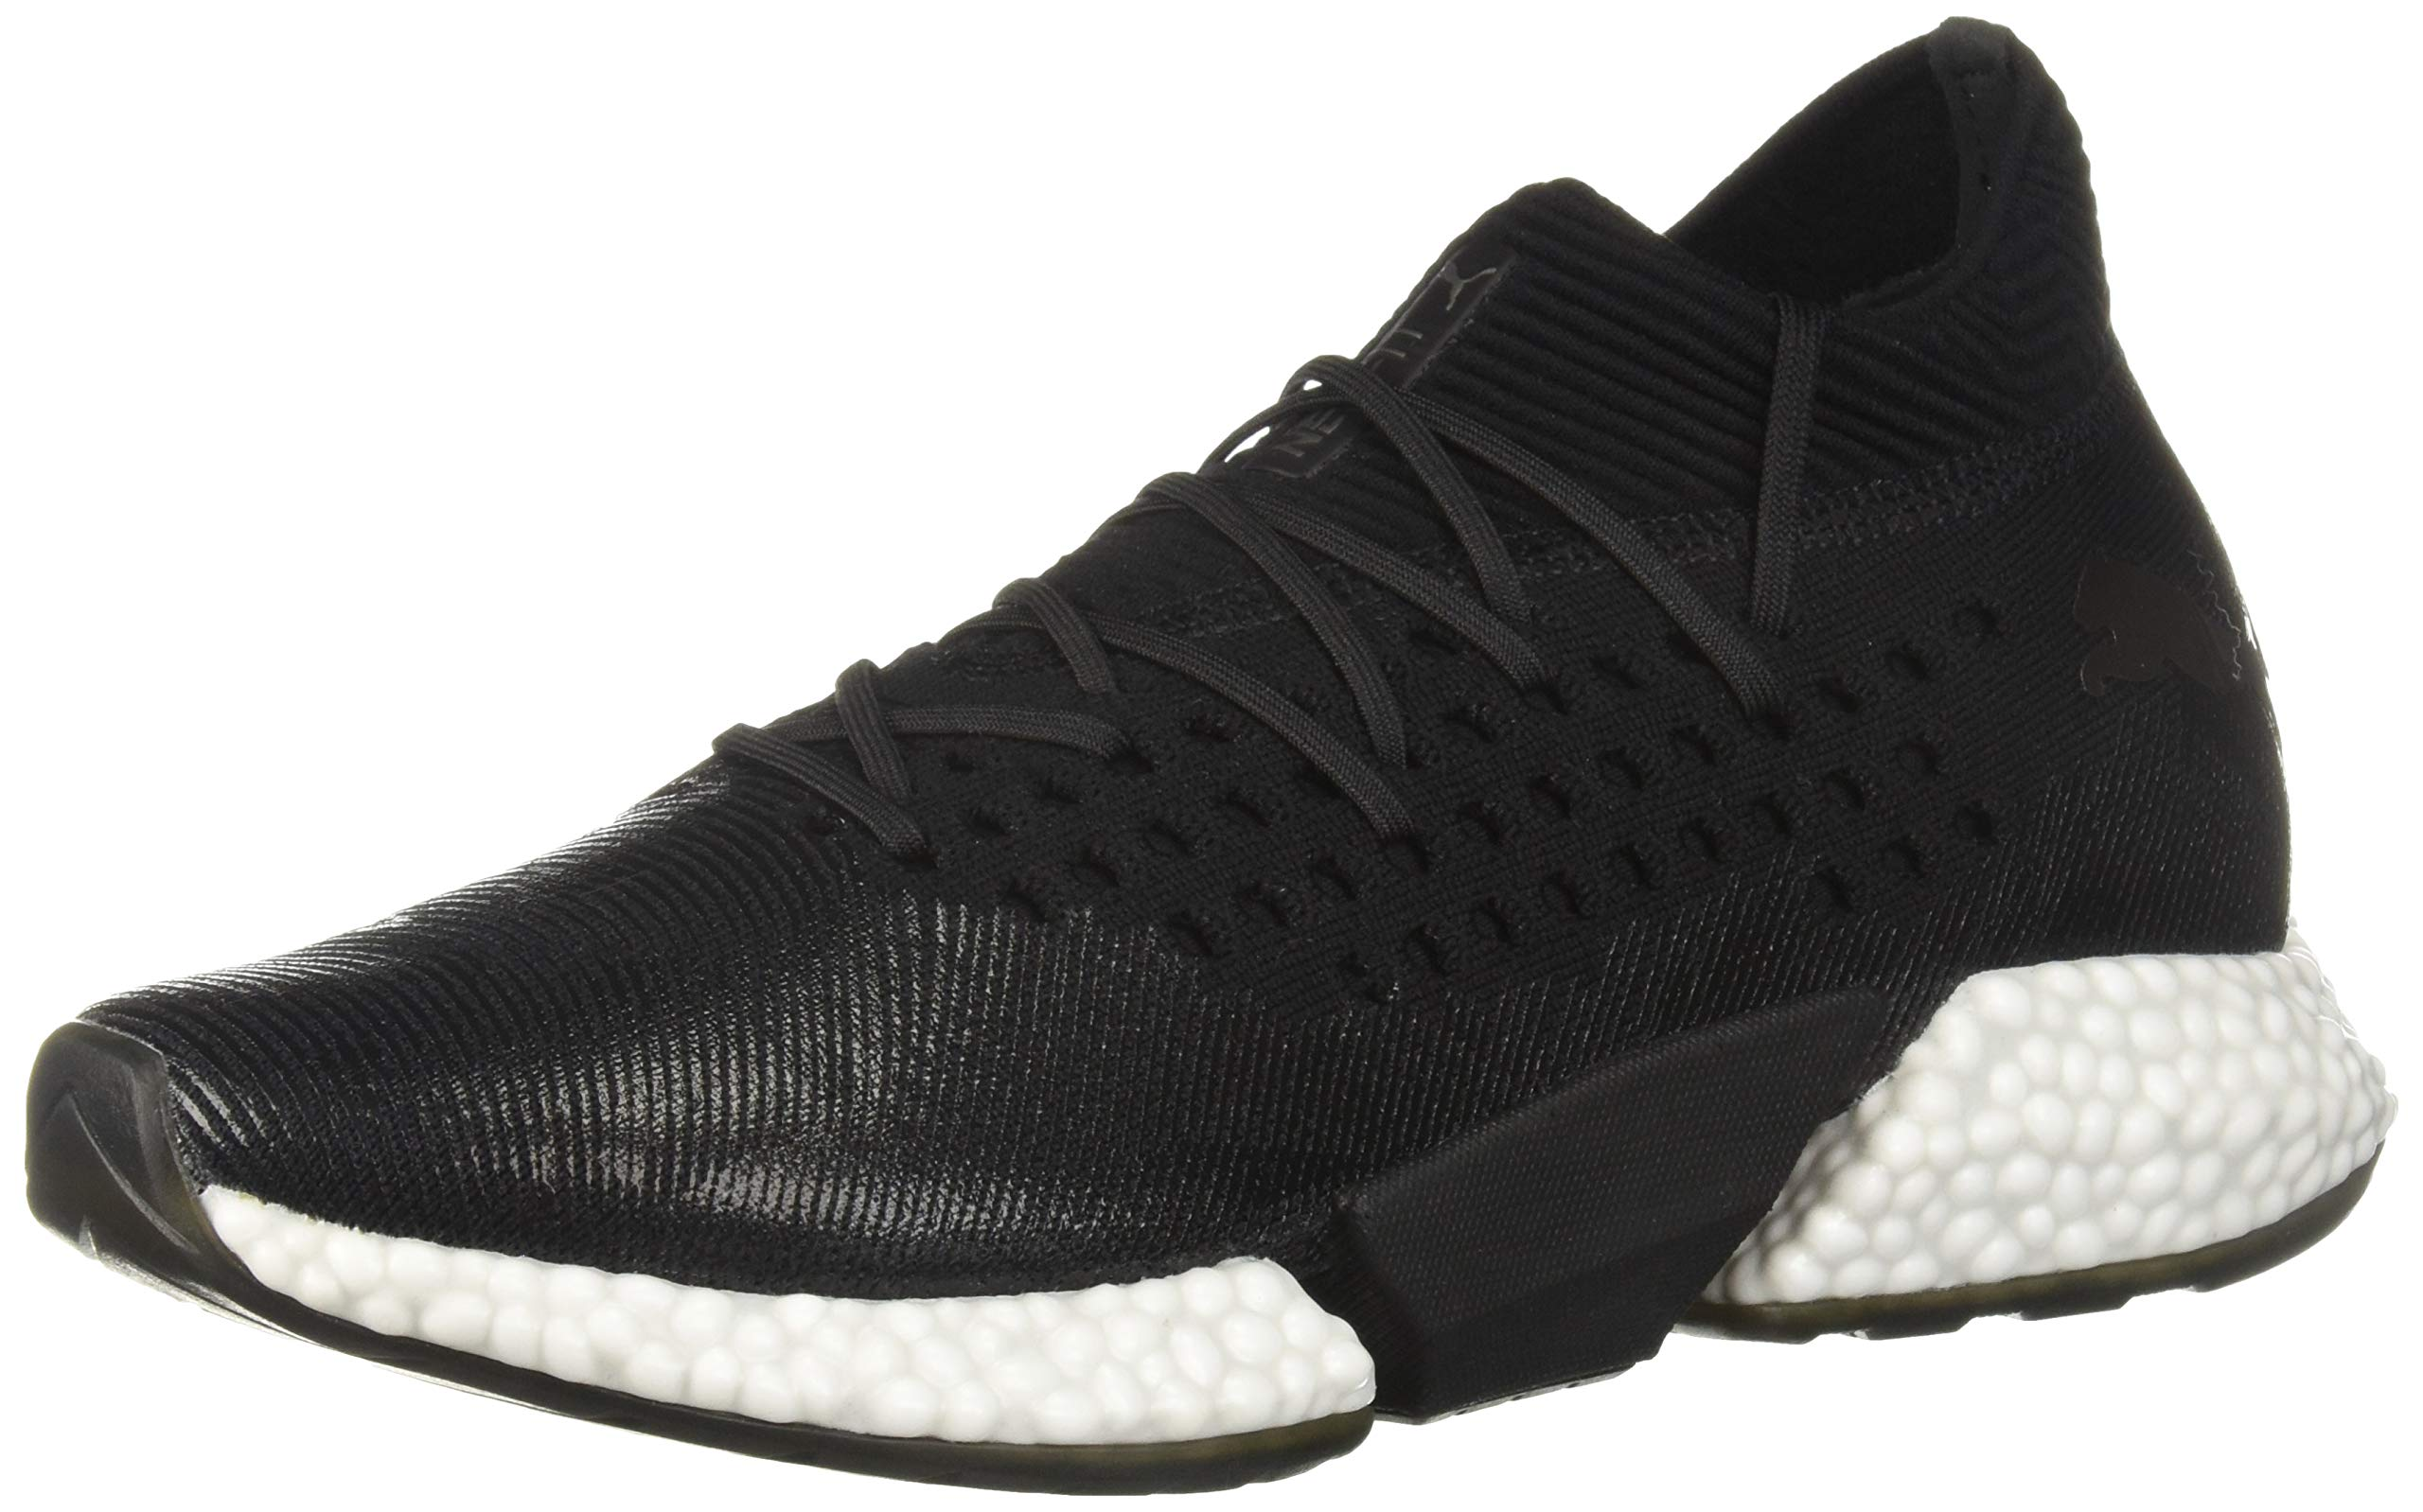 Details Future Szcolor Black M Men's Rocket About Sneaker Puma Choose White7 O0w8nkP